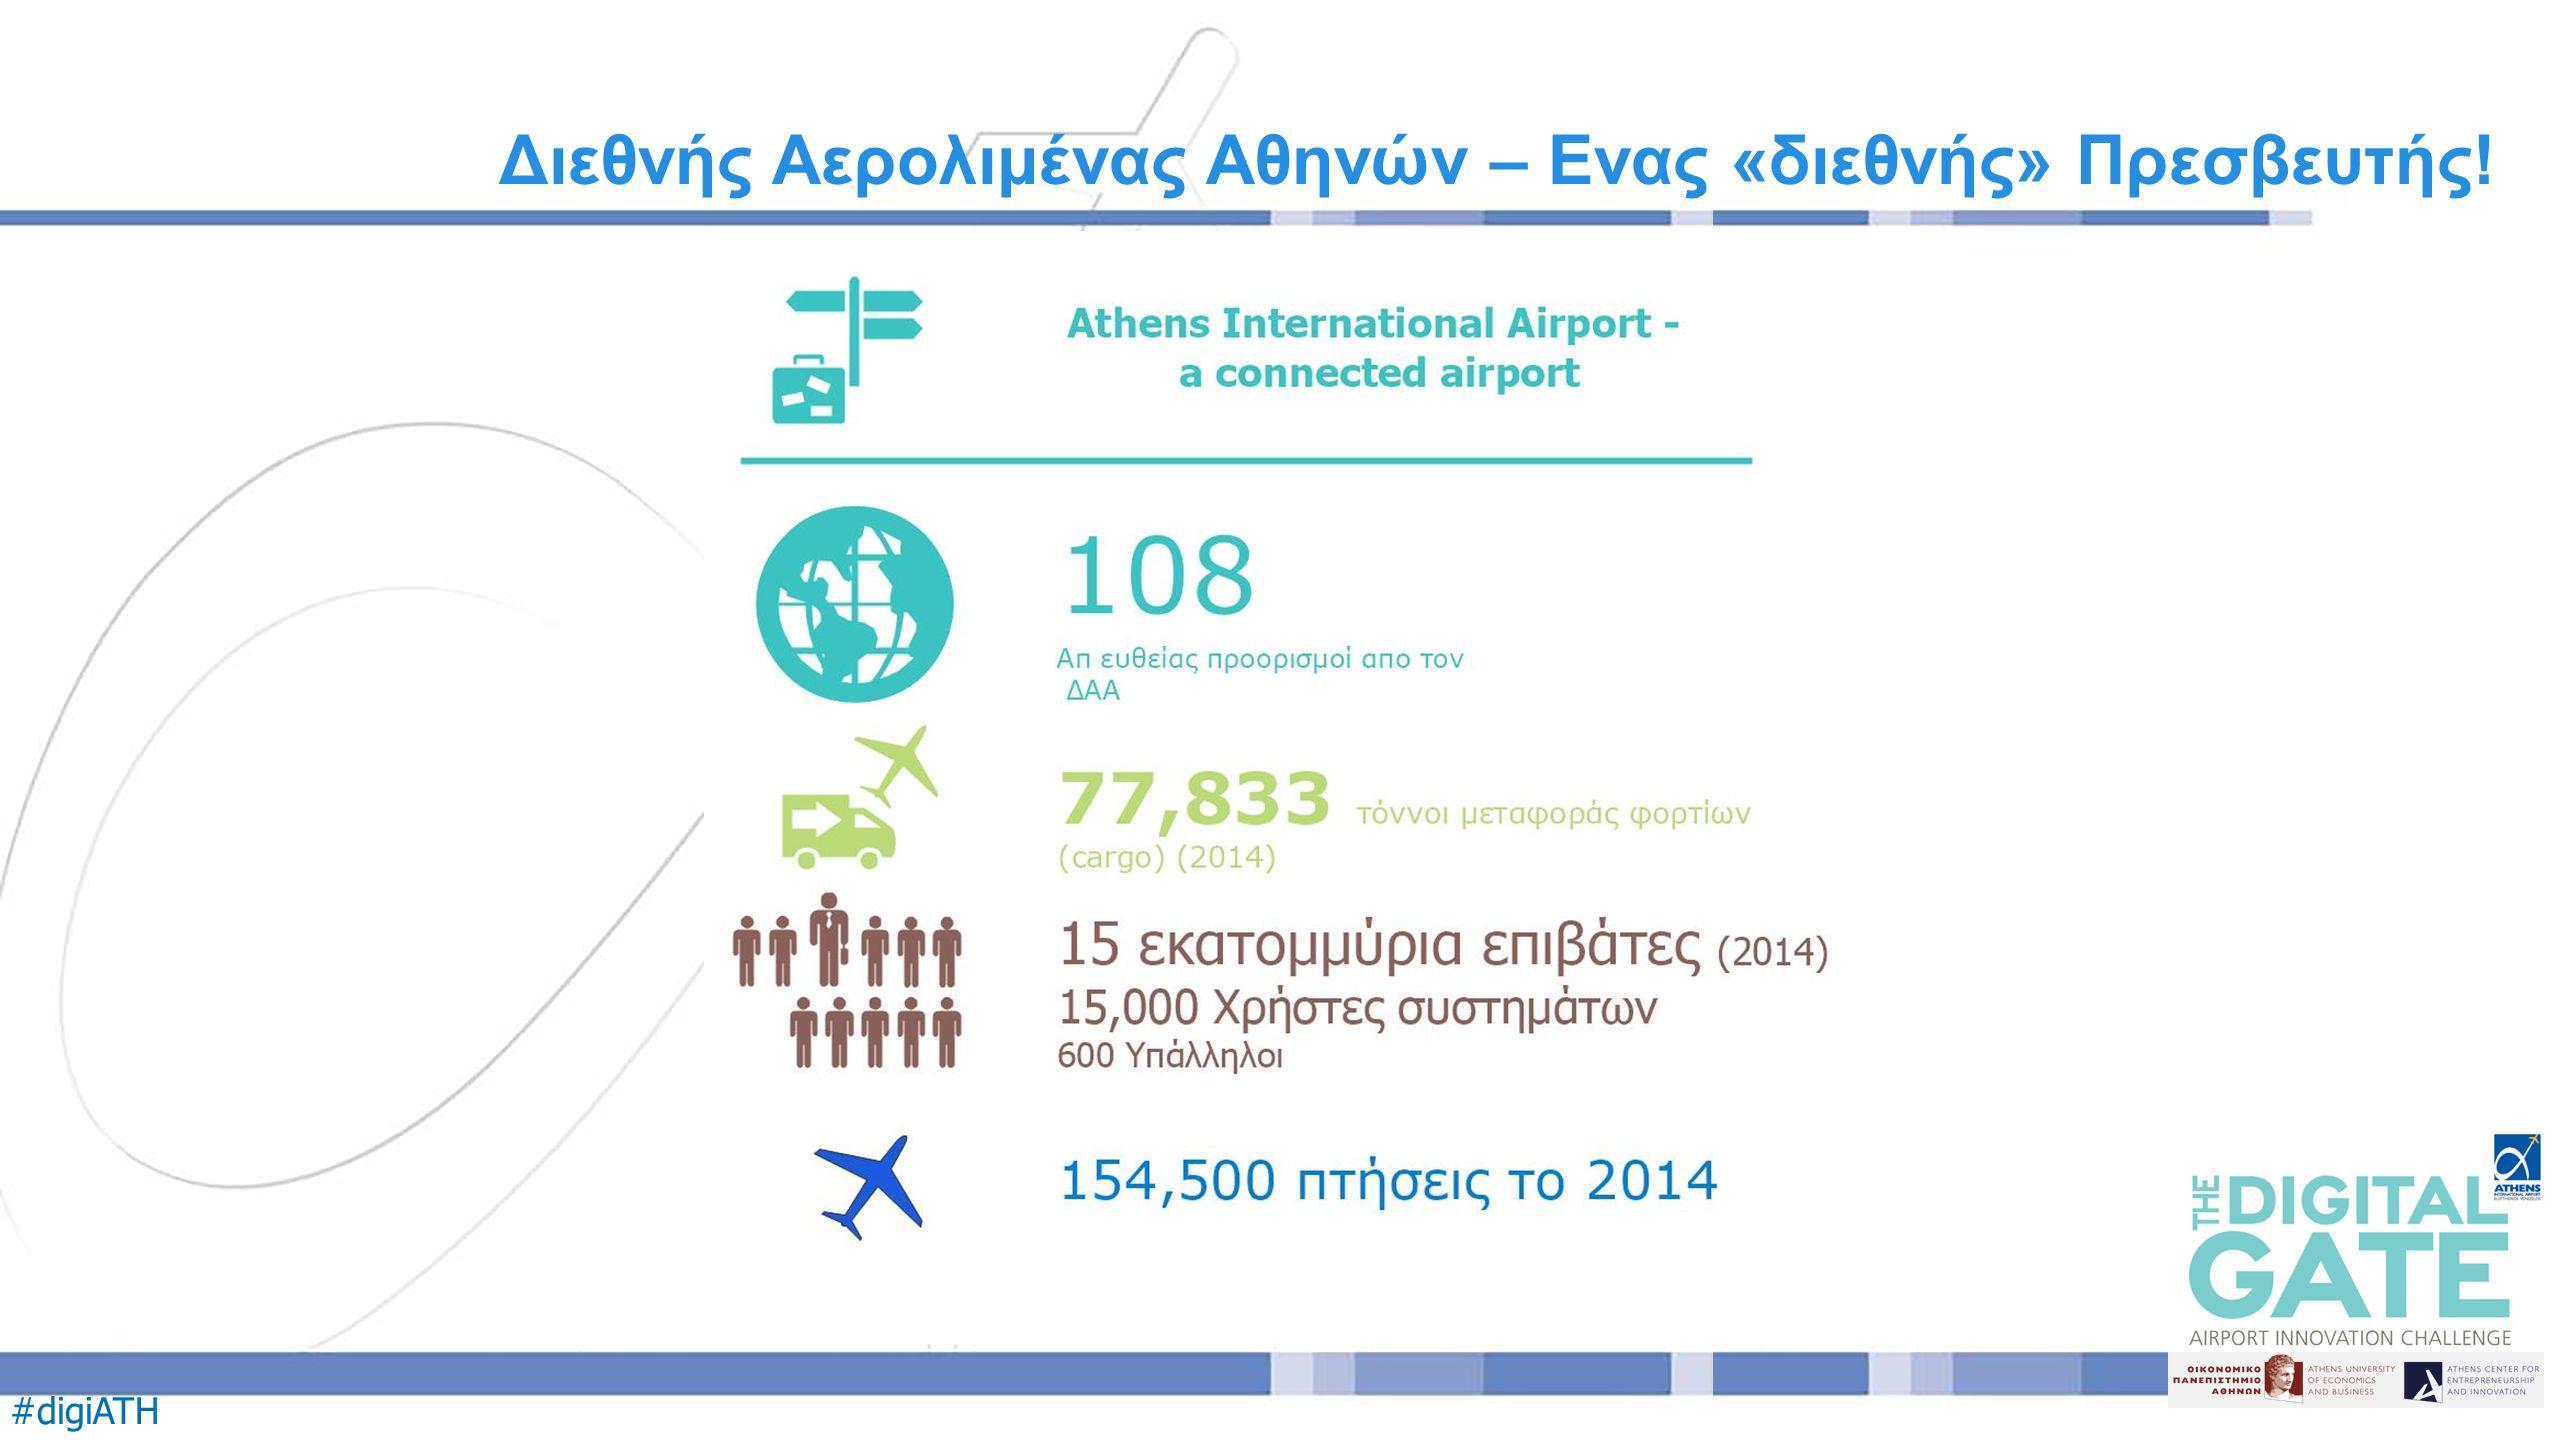 #digiATH Διεθνής Αερολιμένας Αθηνών – Ενας «διεθνής» Πρεσβευτής!